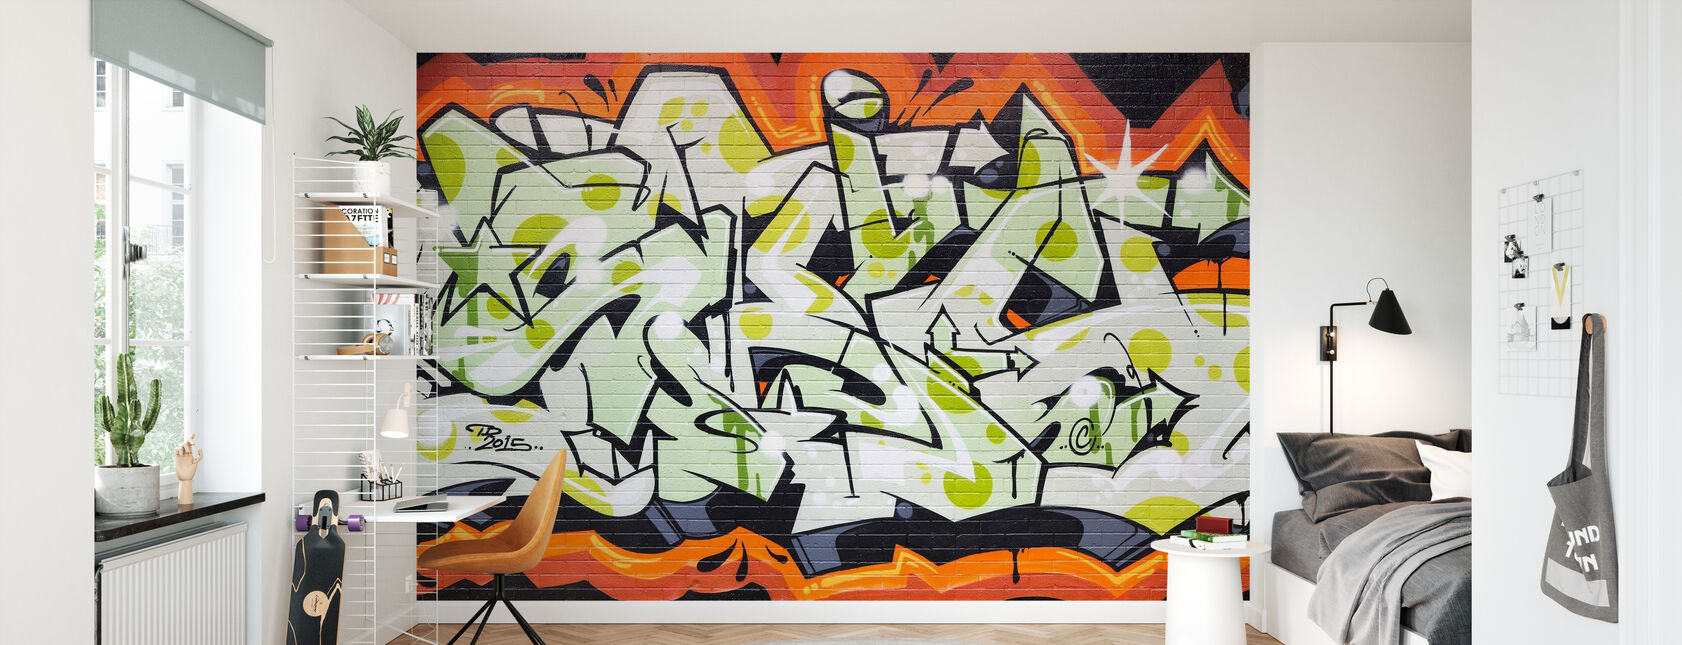 Skil - Wallpaper - Kids Room